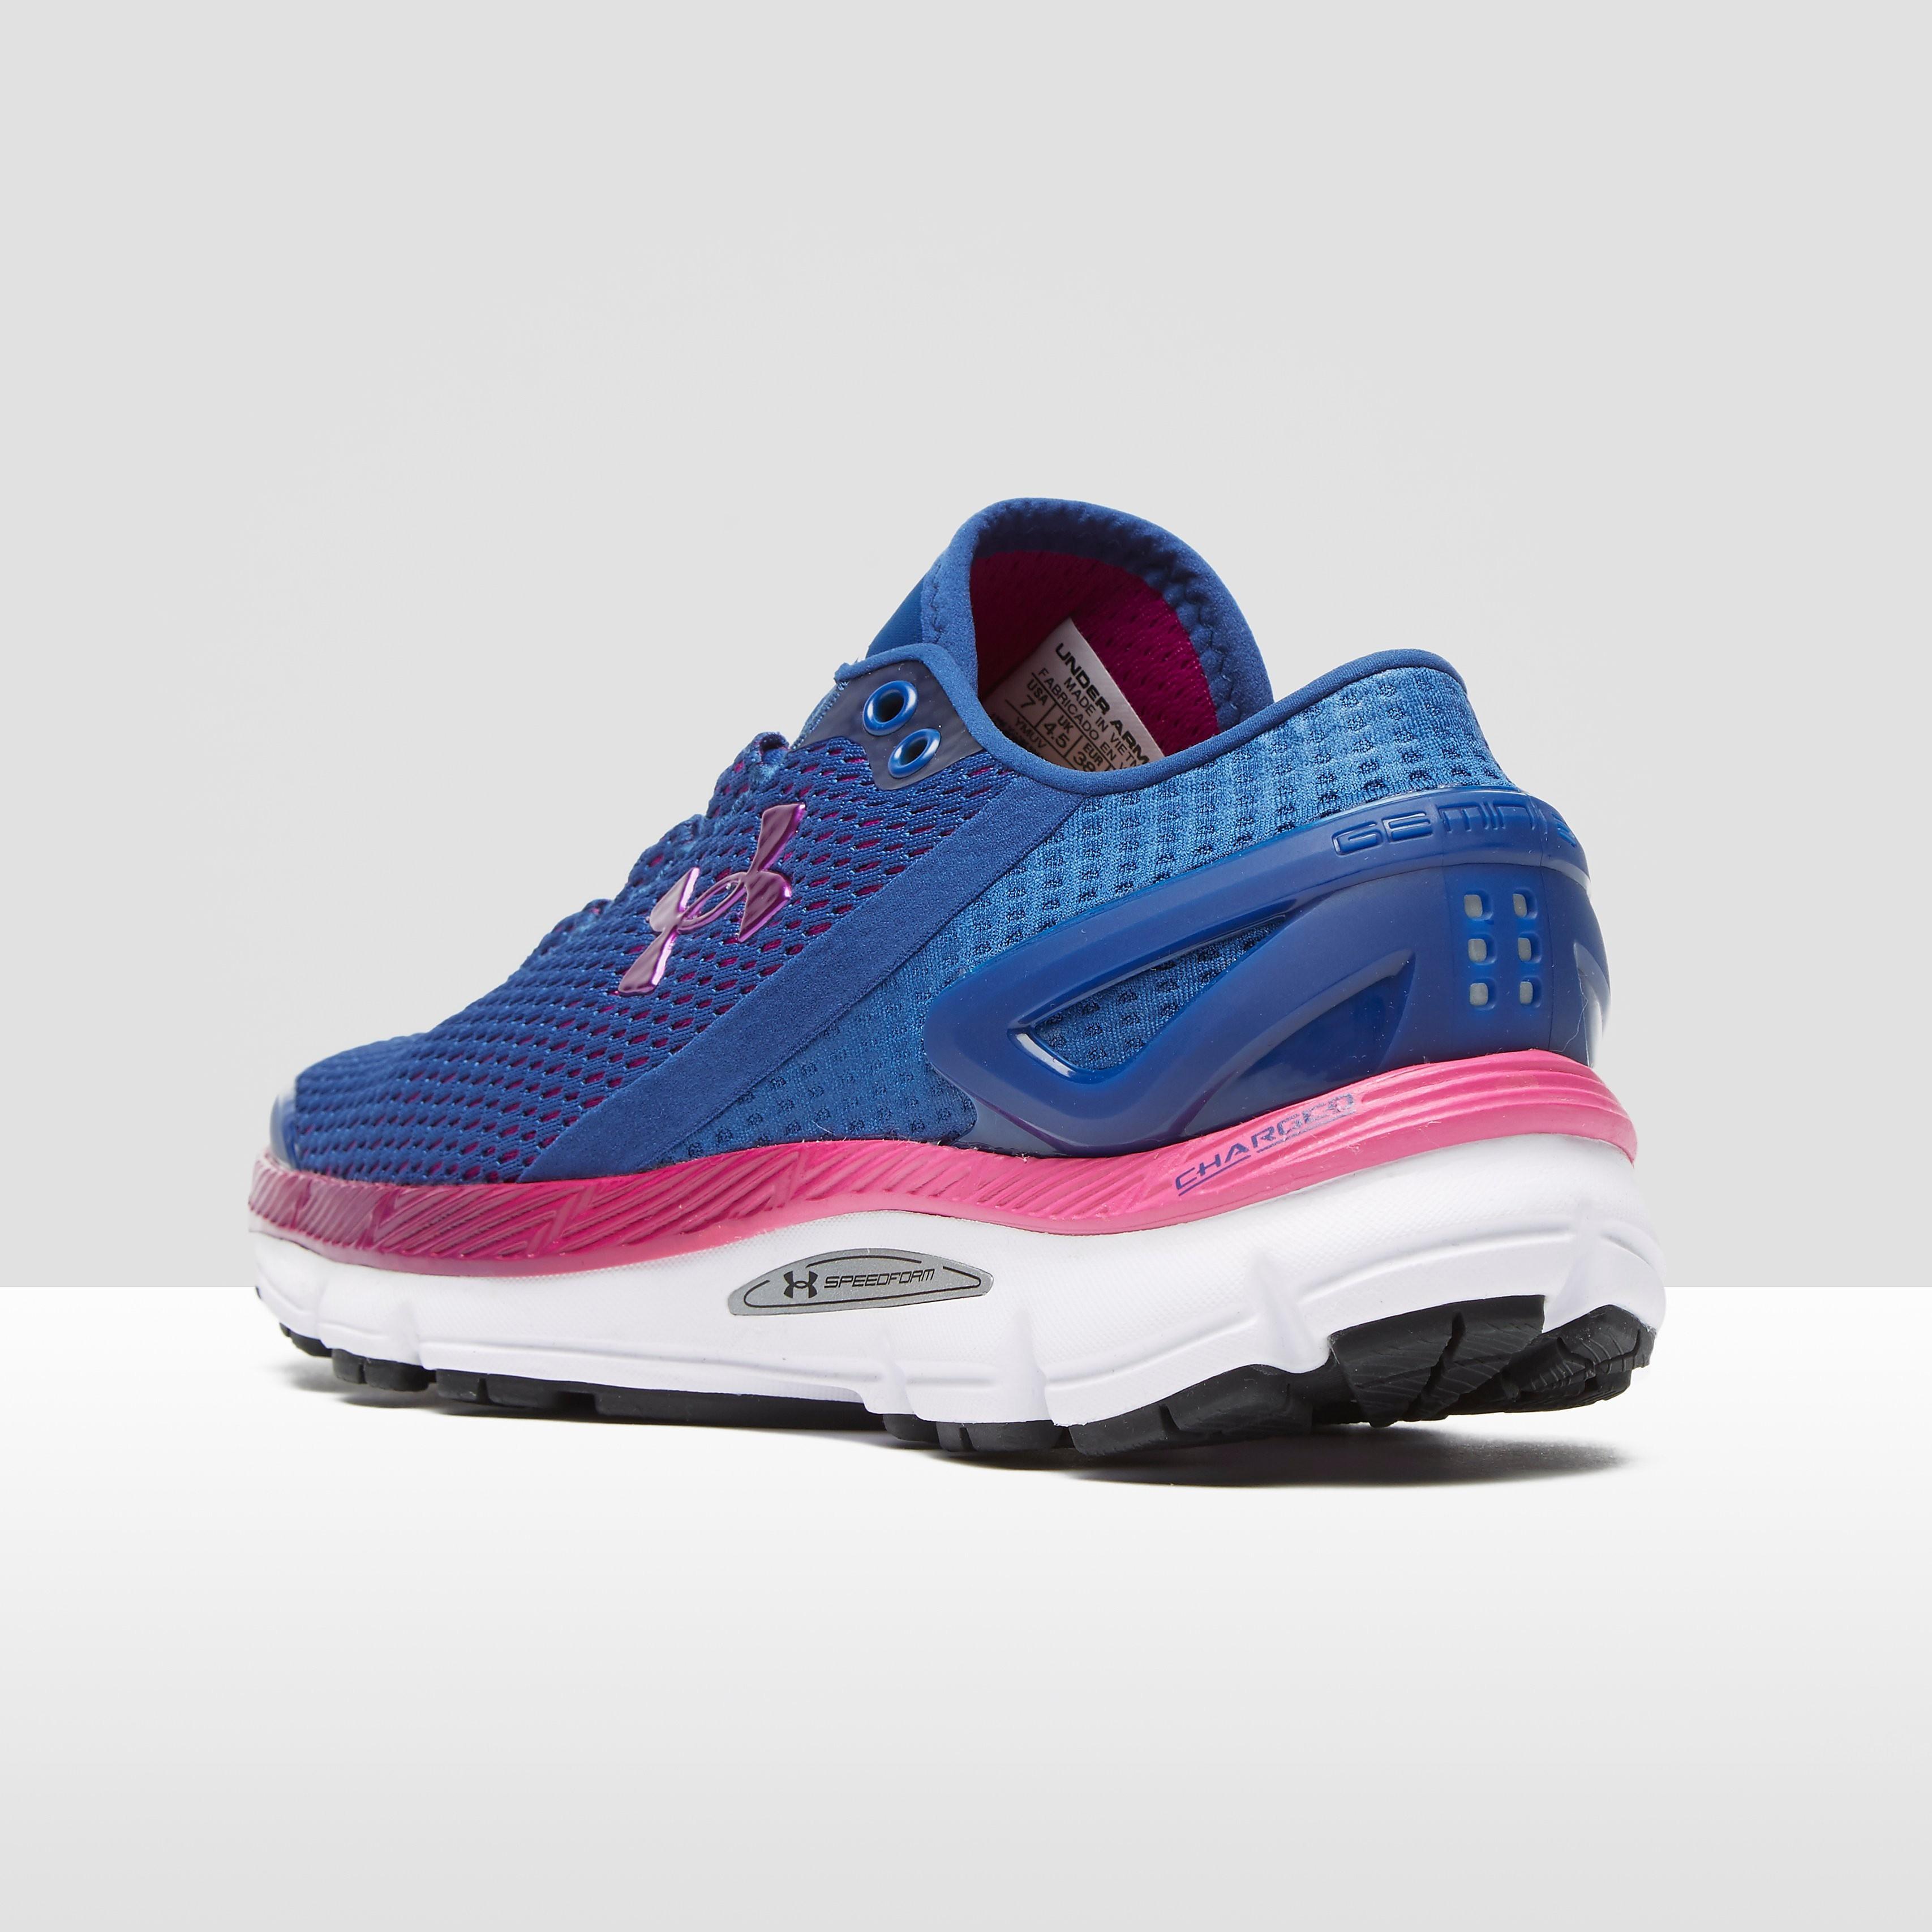 Under Armour SpeedForm Gemini 2.1 Women's Running Shoes